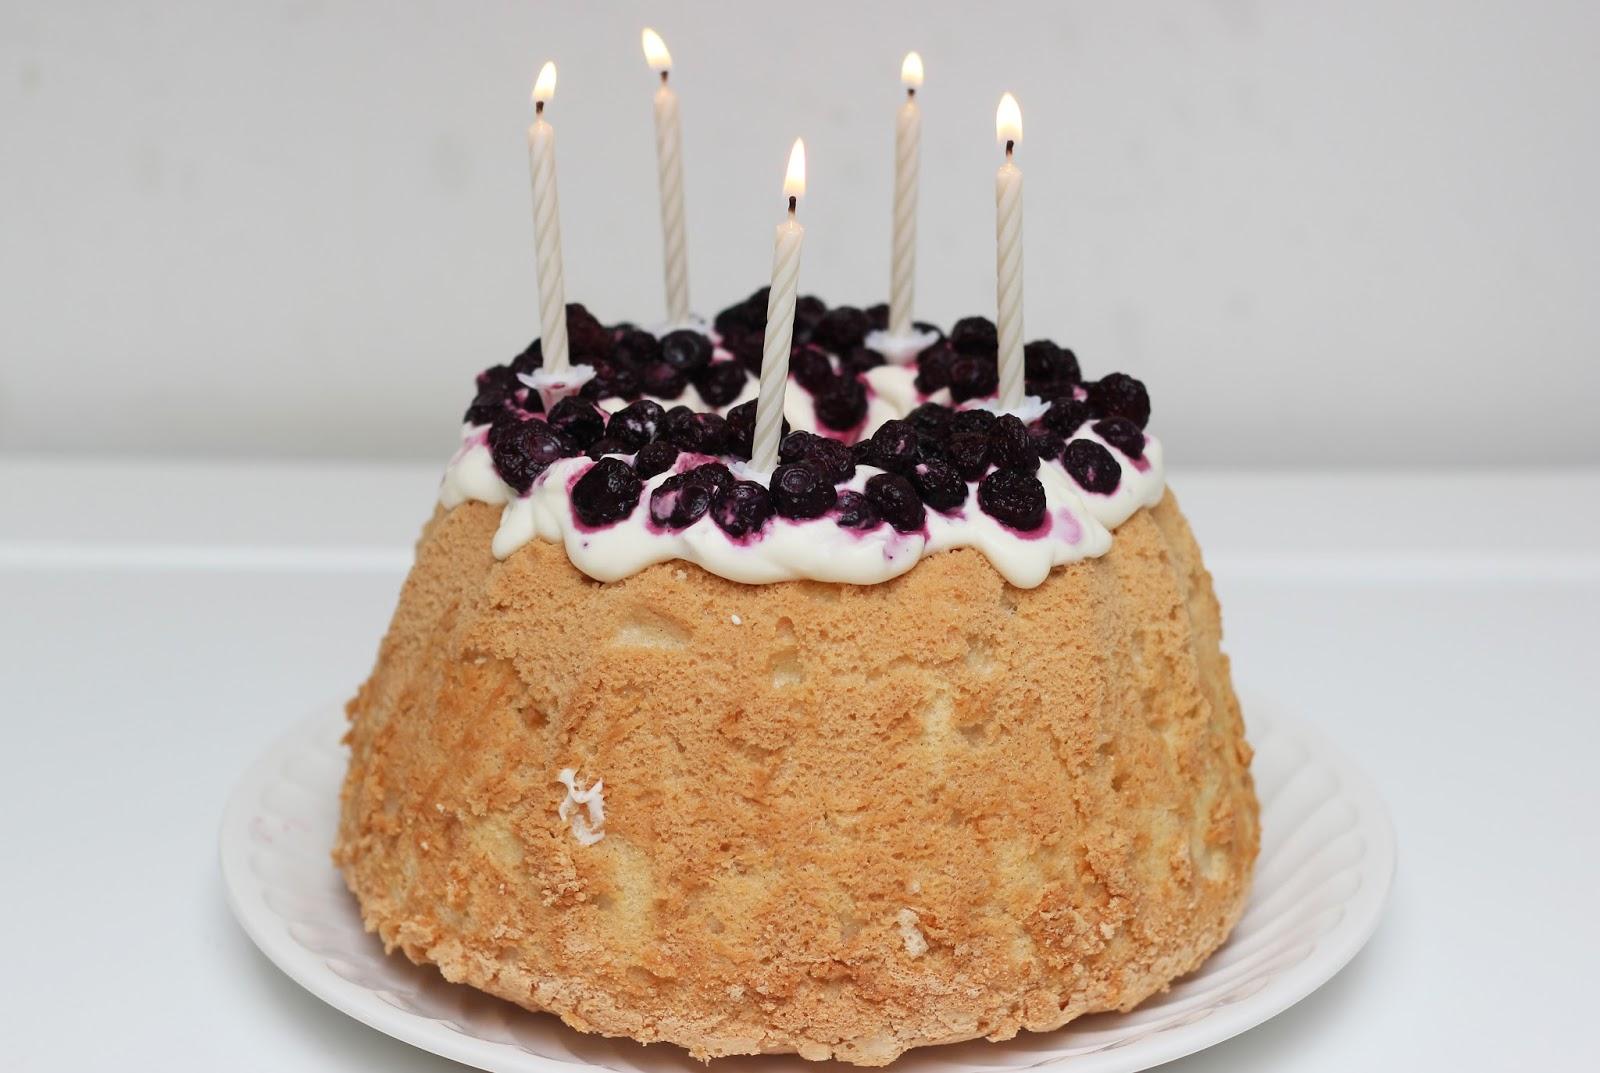 http://carnet-sucre.blogspot.com/2016/04/angel-cake.html